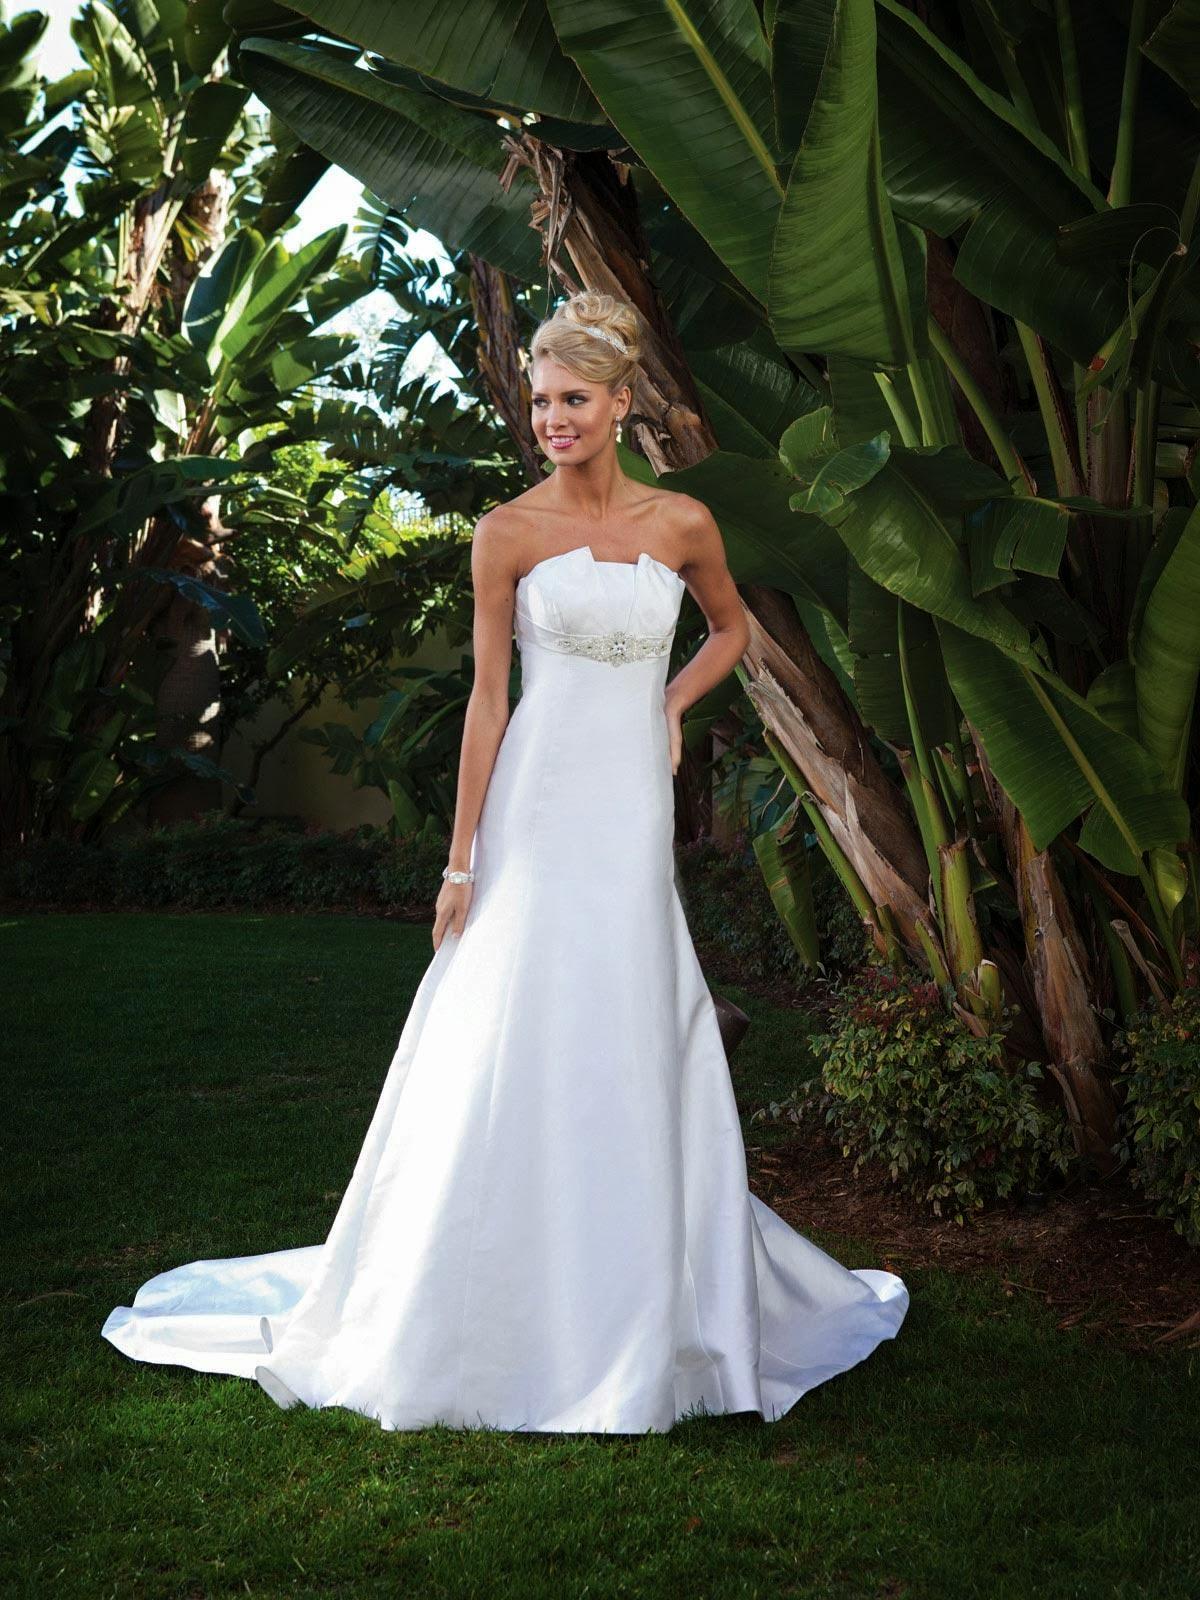 old lady wedding dresses - Wedding Decor Ideas